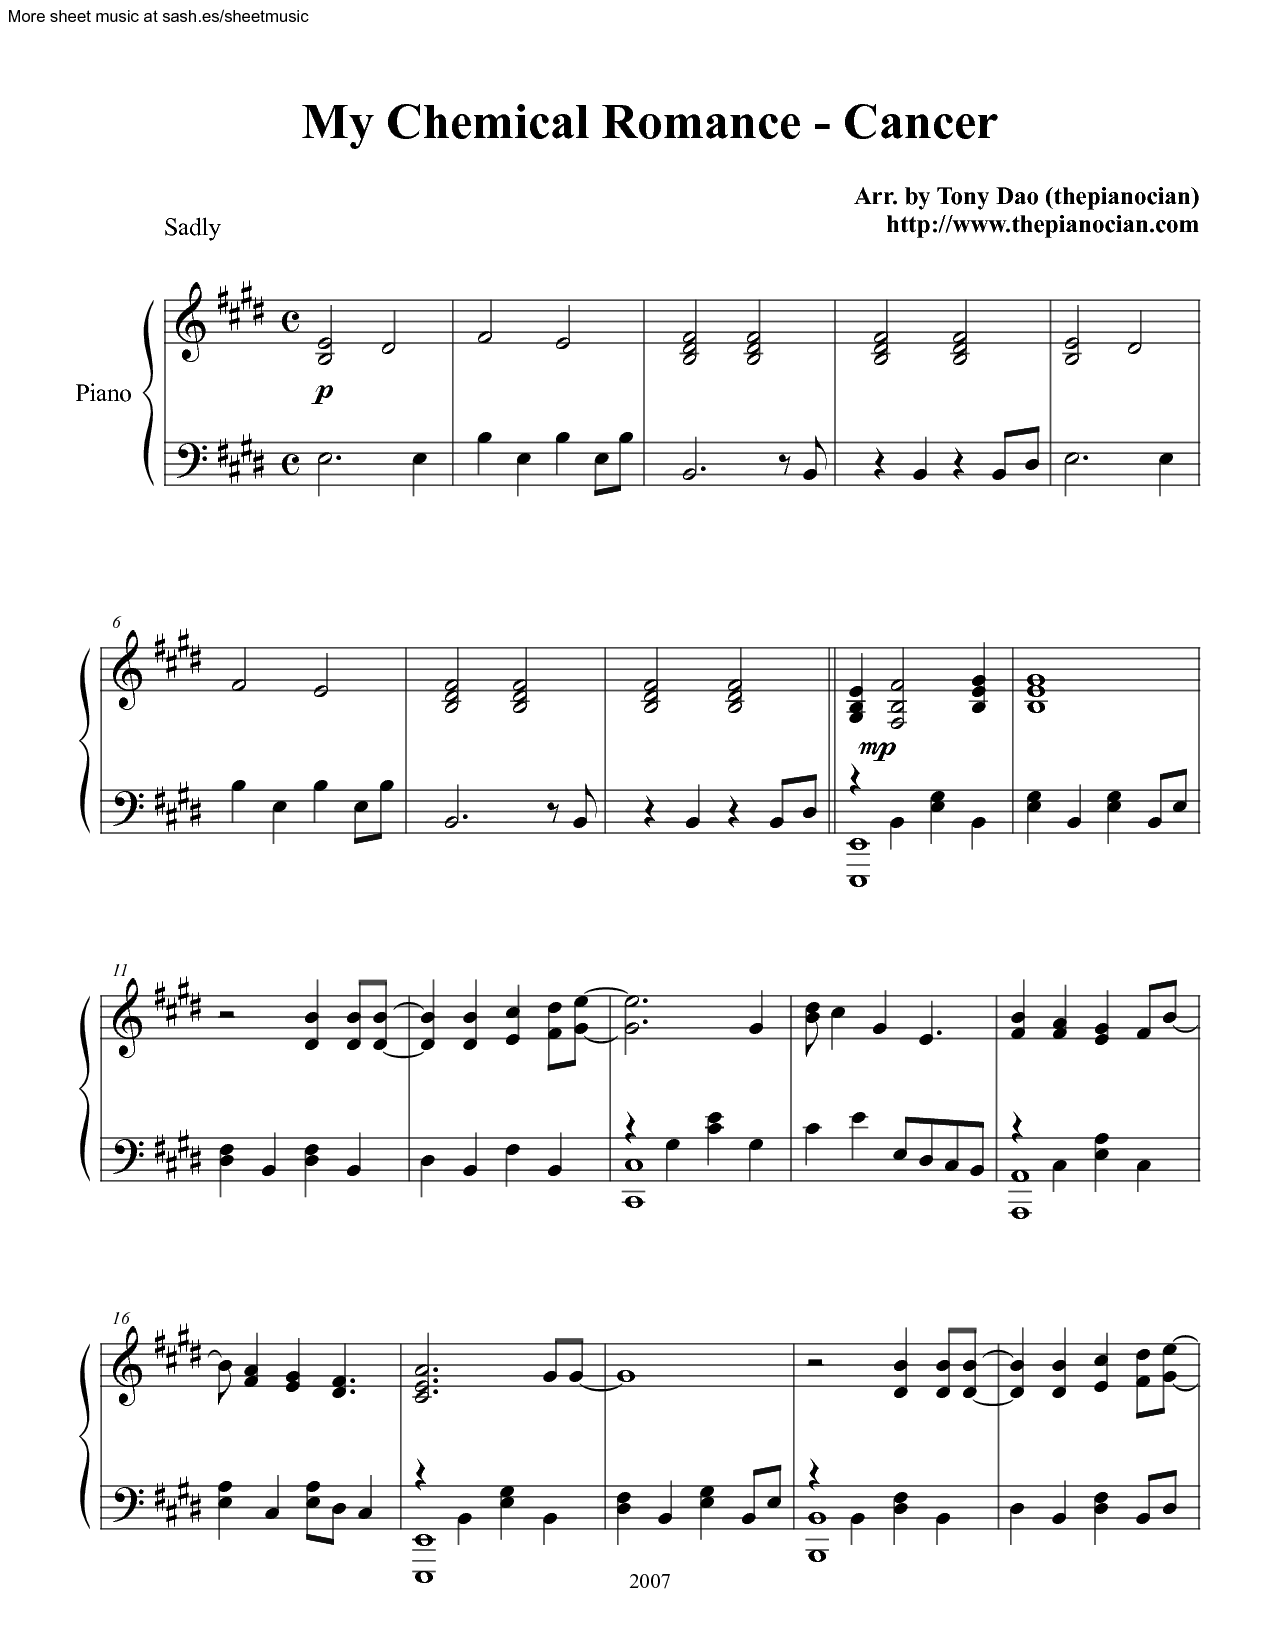 My Chemical Romance Clarinet Sheet Music Google Search Music